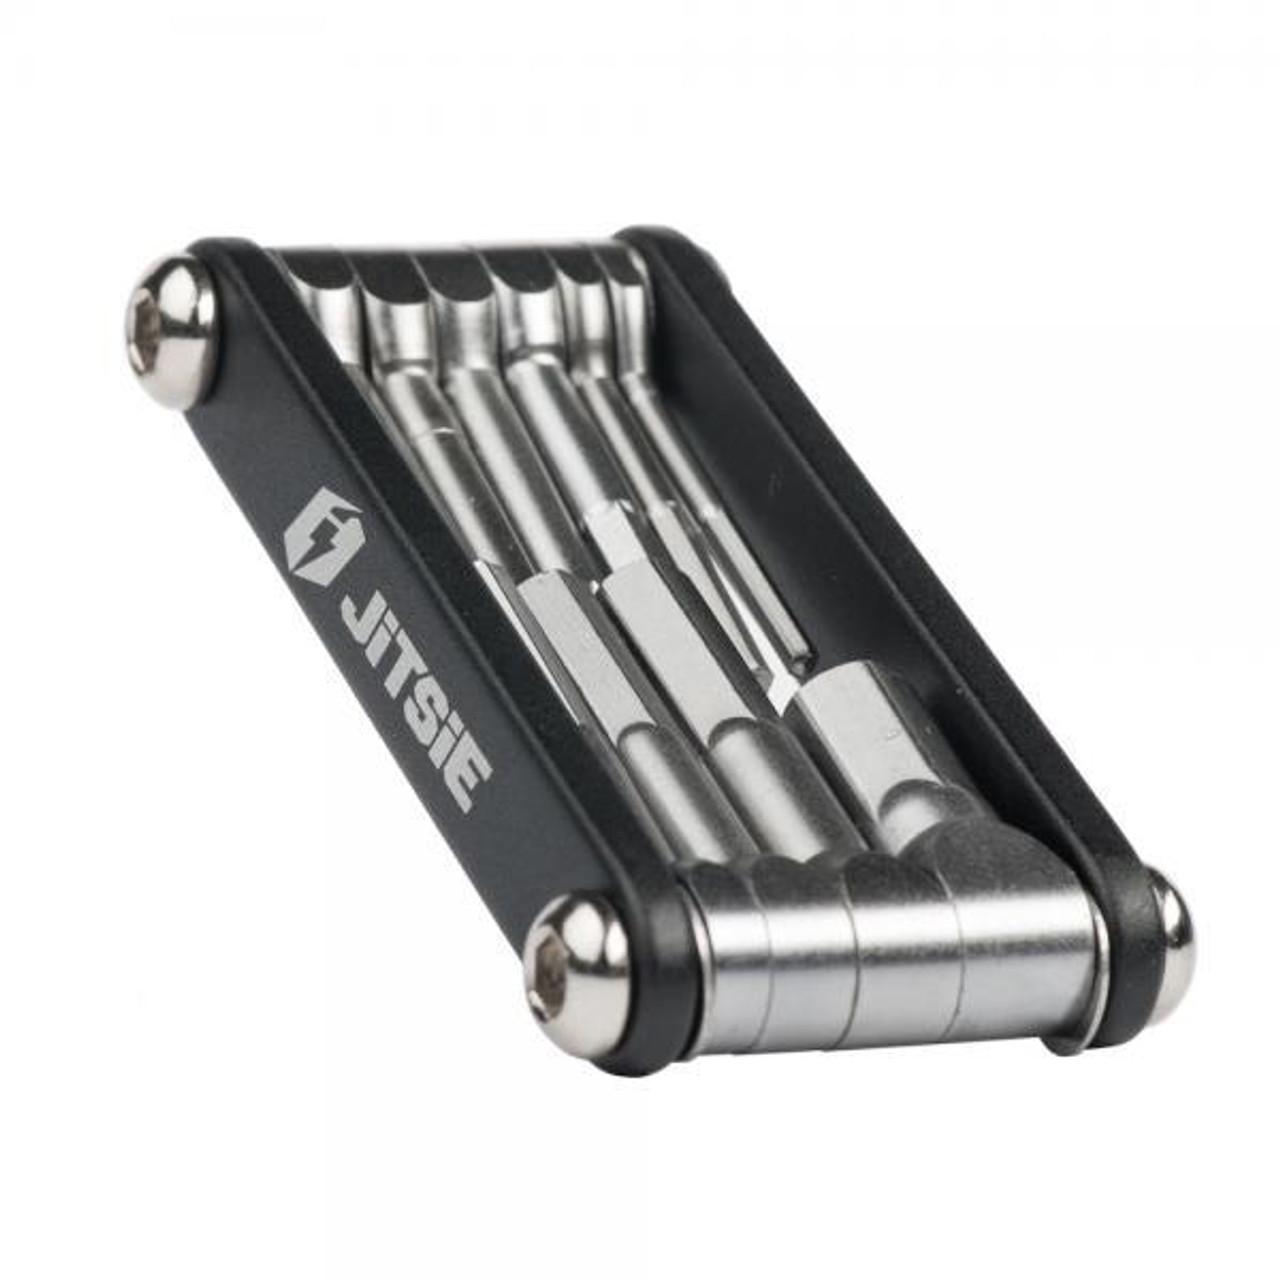 JI616-MULTITOOL10, handy multi-tool from Jitsie for quick repairs on the go